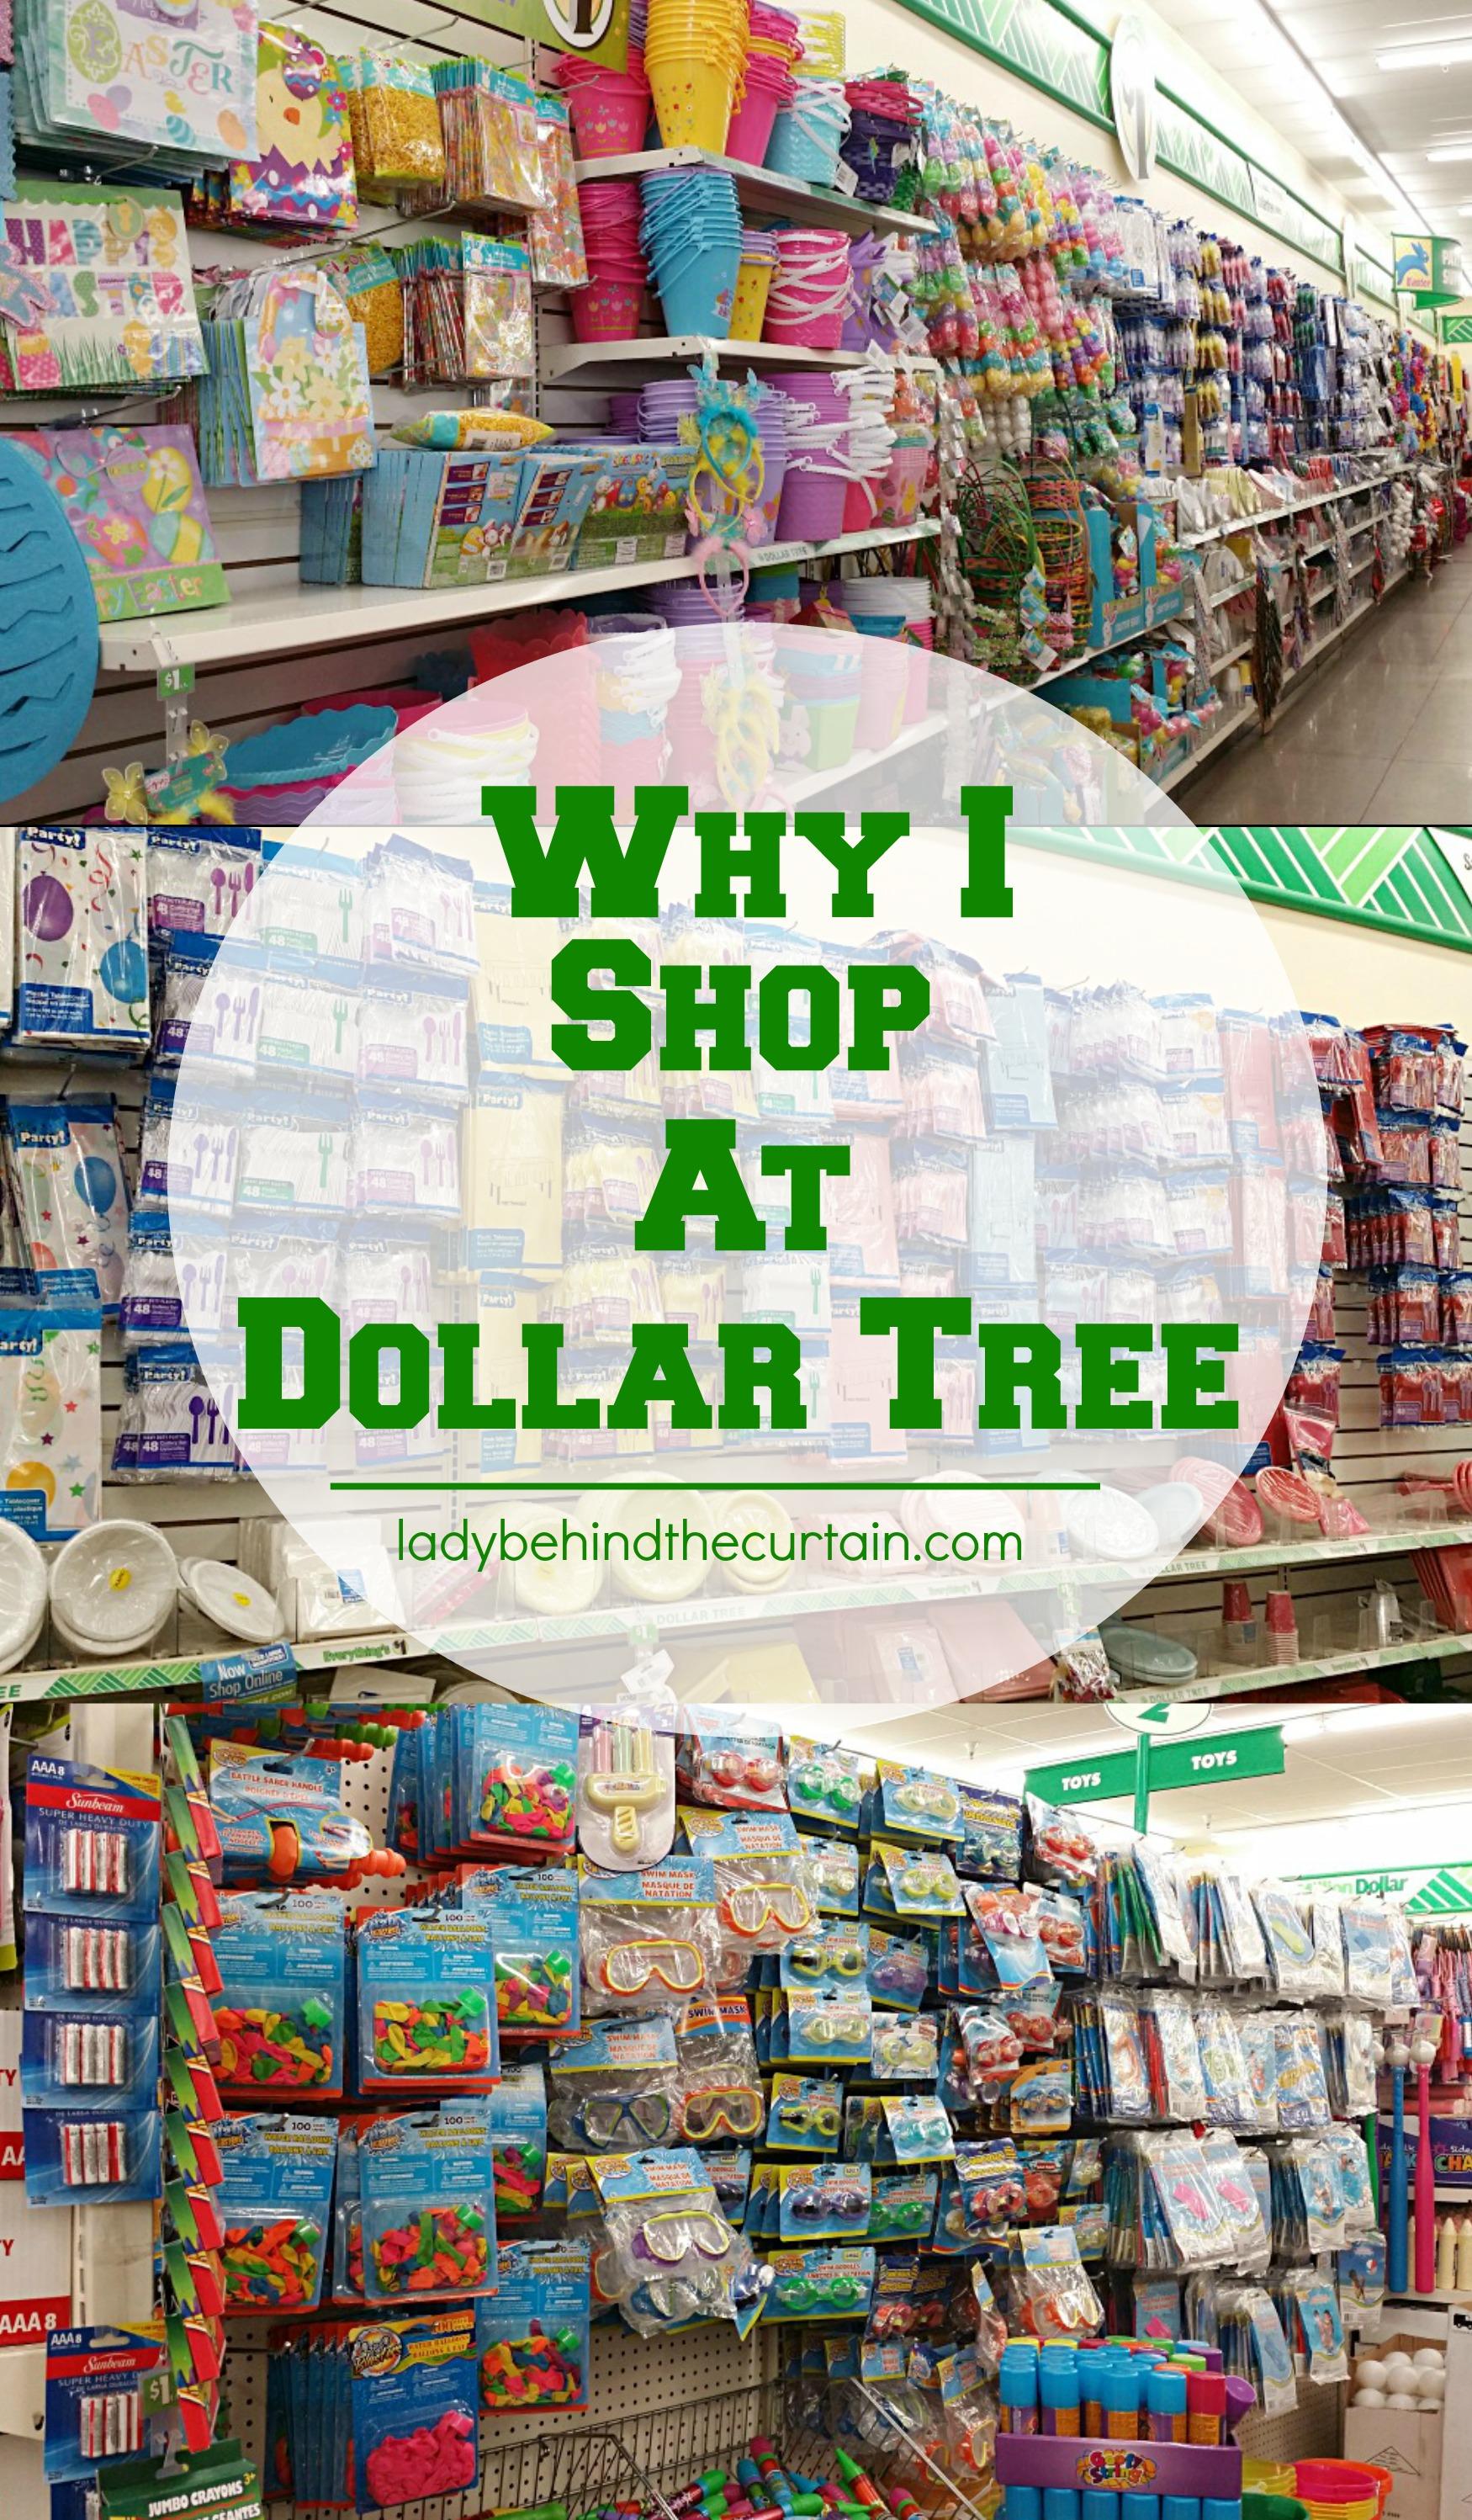 I Shop at Dollar Tree